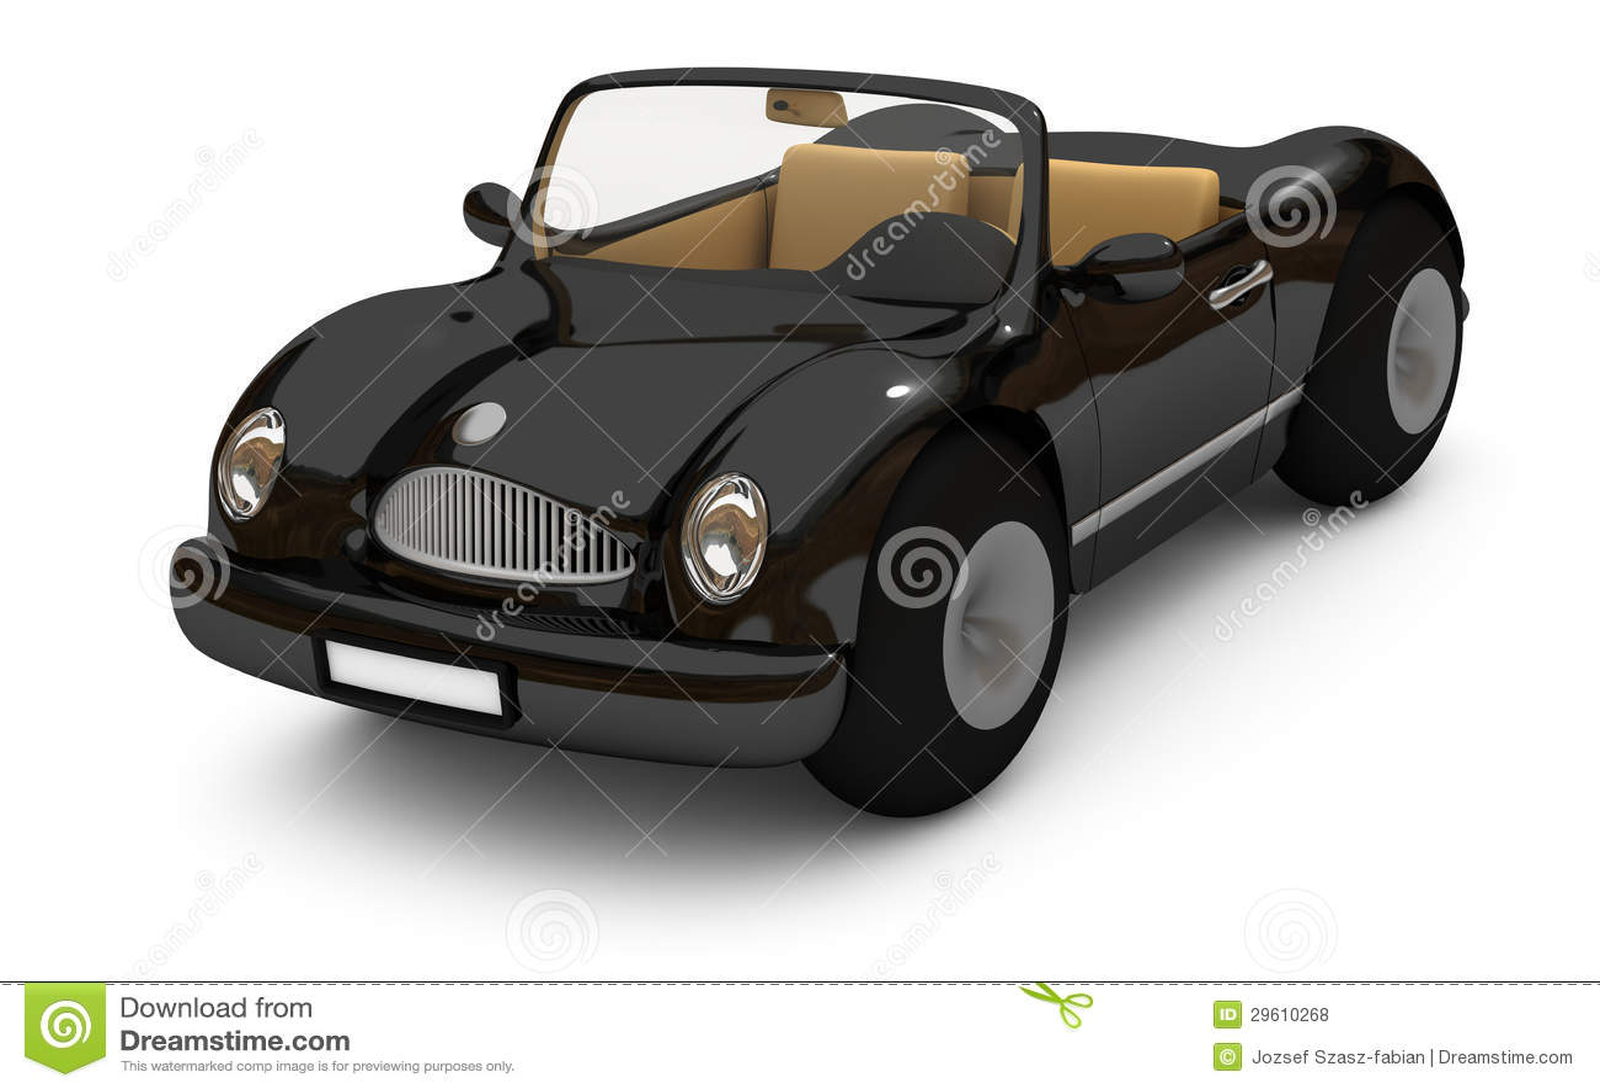 svart skåp bil ~ 3drendering av en svart bil royaltyfria foton  bild